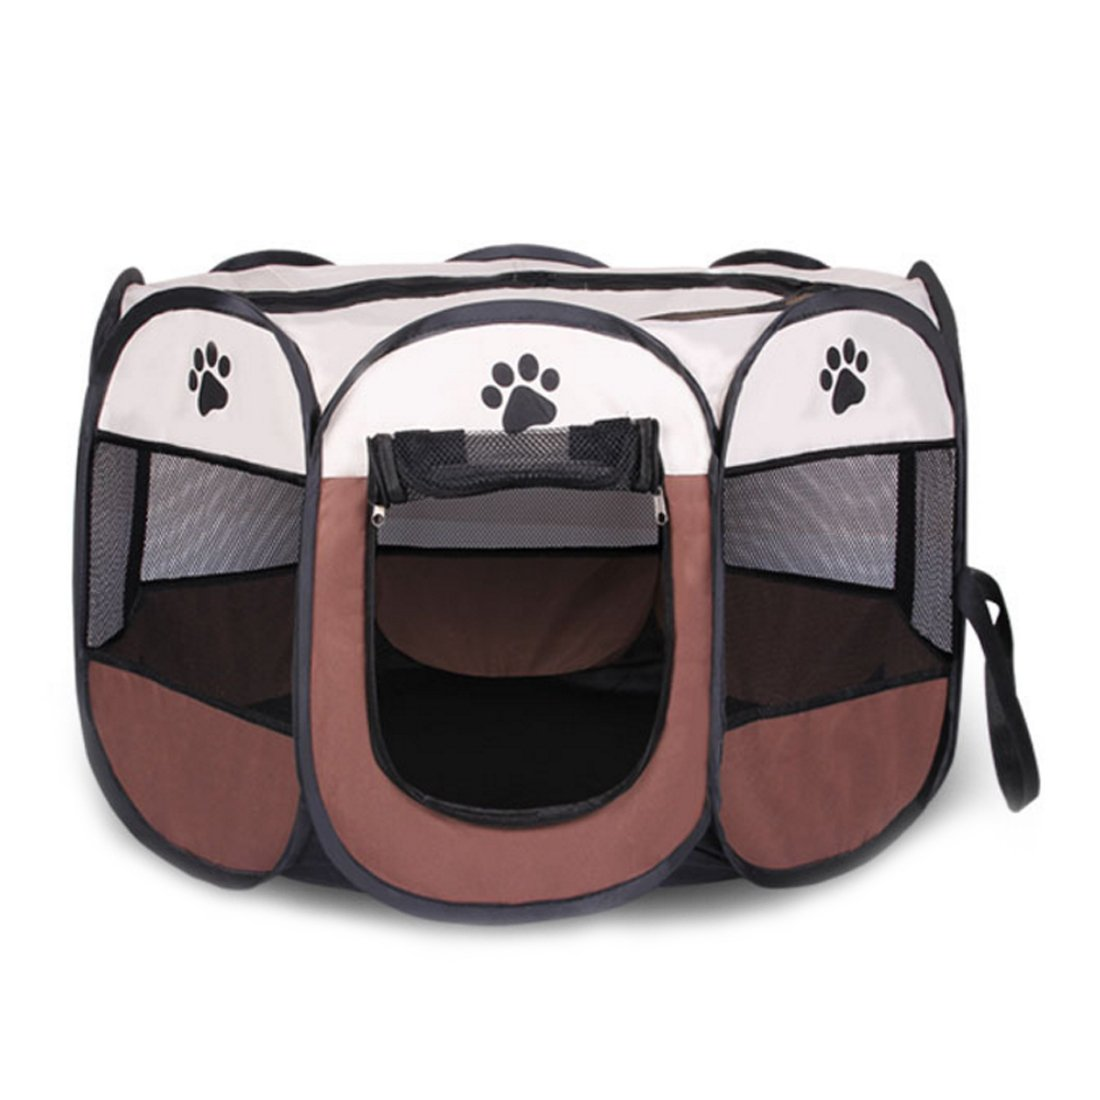 HMANE Foldable Pet Playpen Dog Cat Tent Fence Portable Pet Cage Exercise Fence Kennel